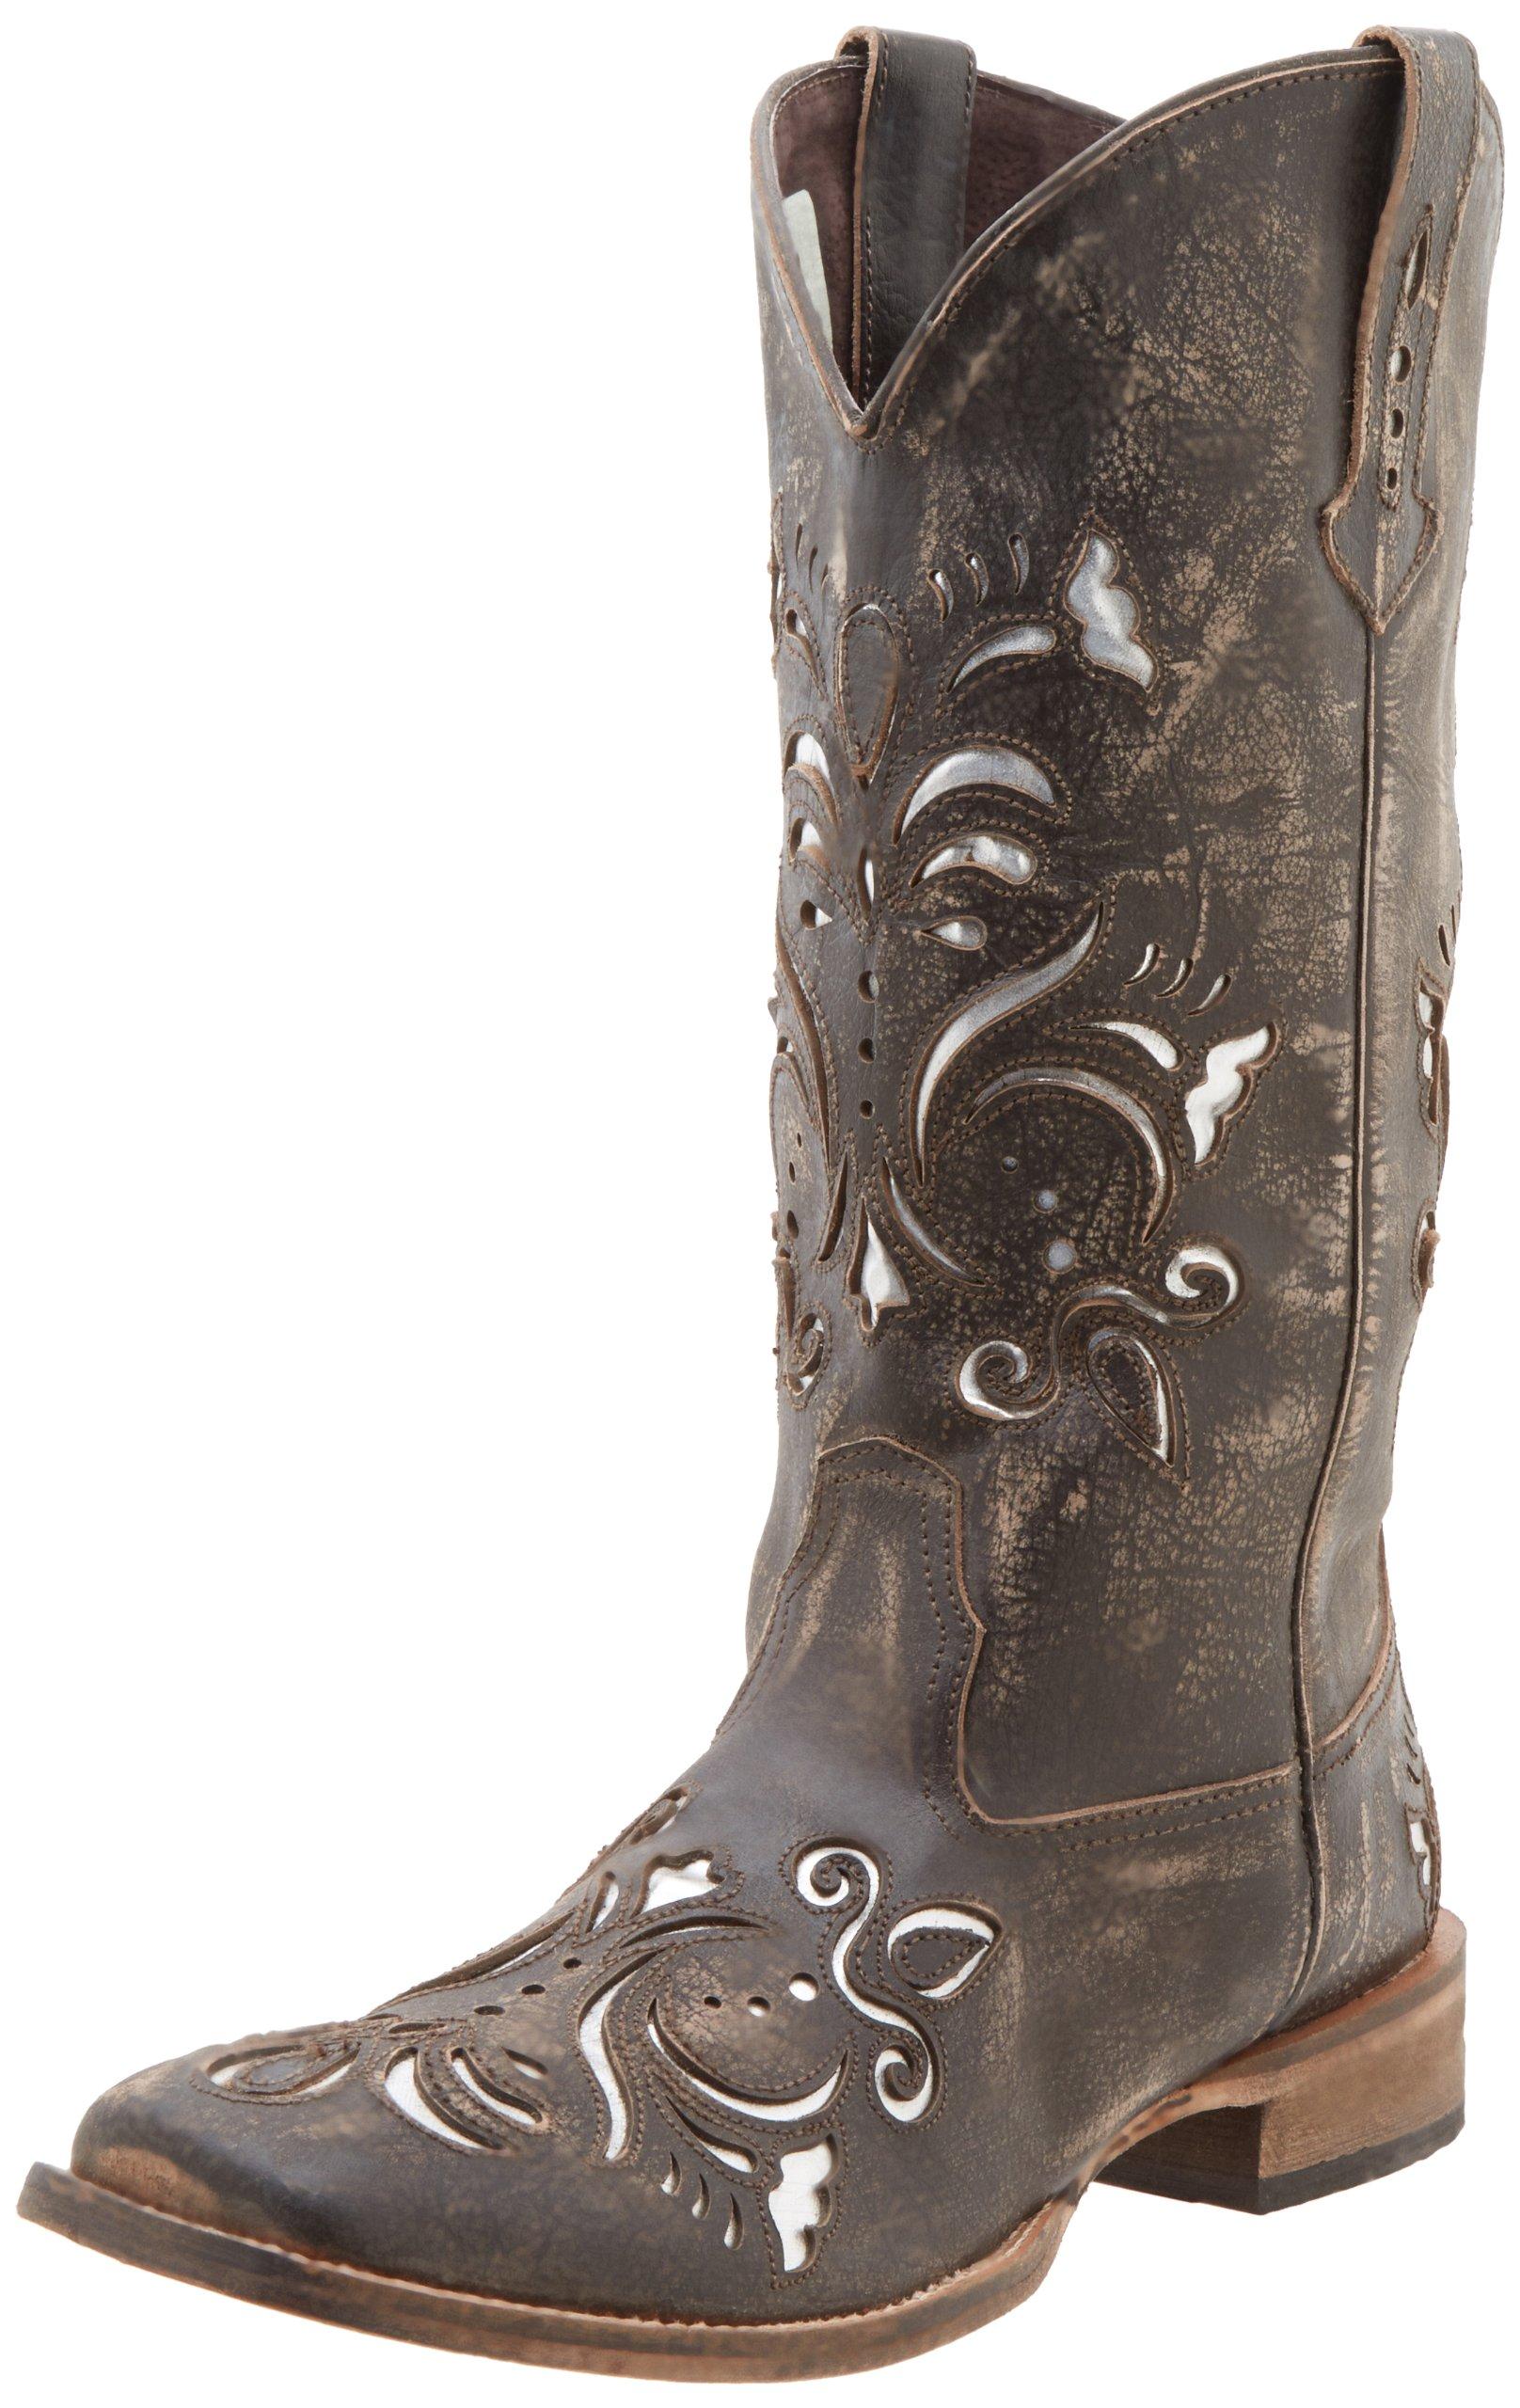 Roper Women's Laser Cut Metallic Underlay Boot Tan/Silver 7 M